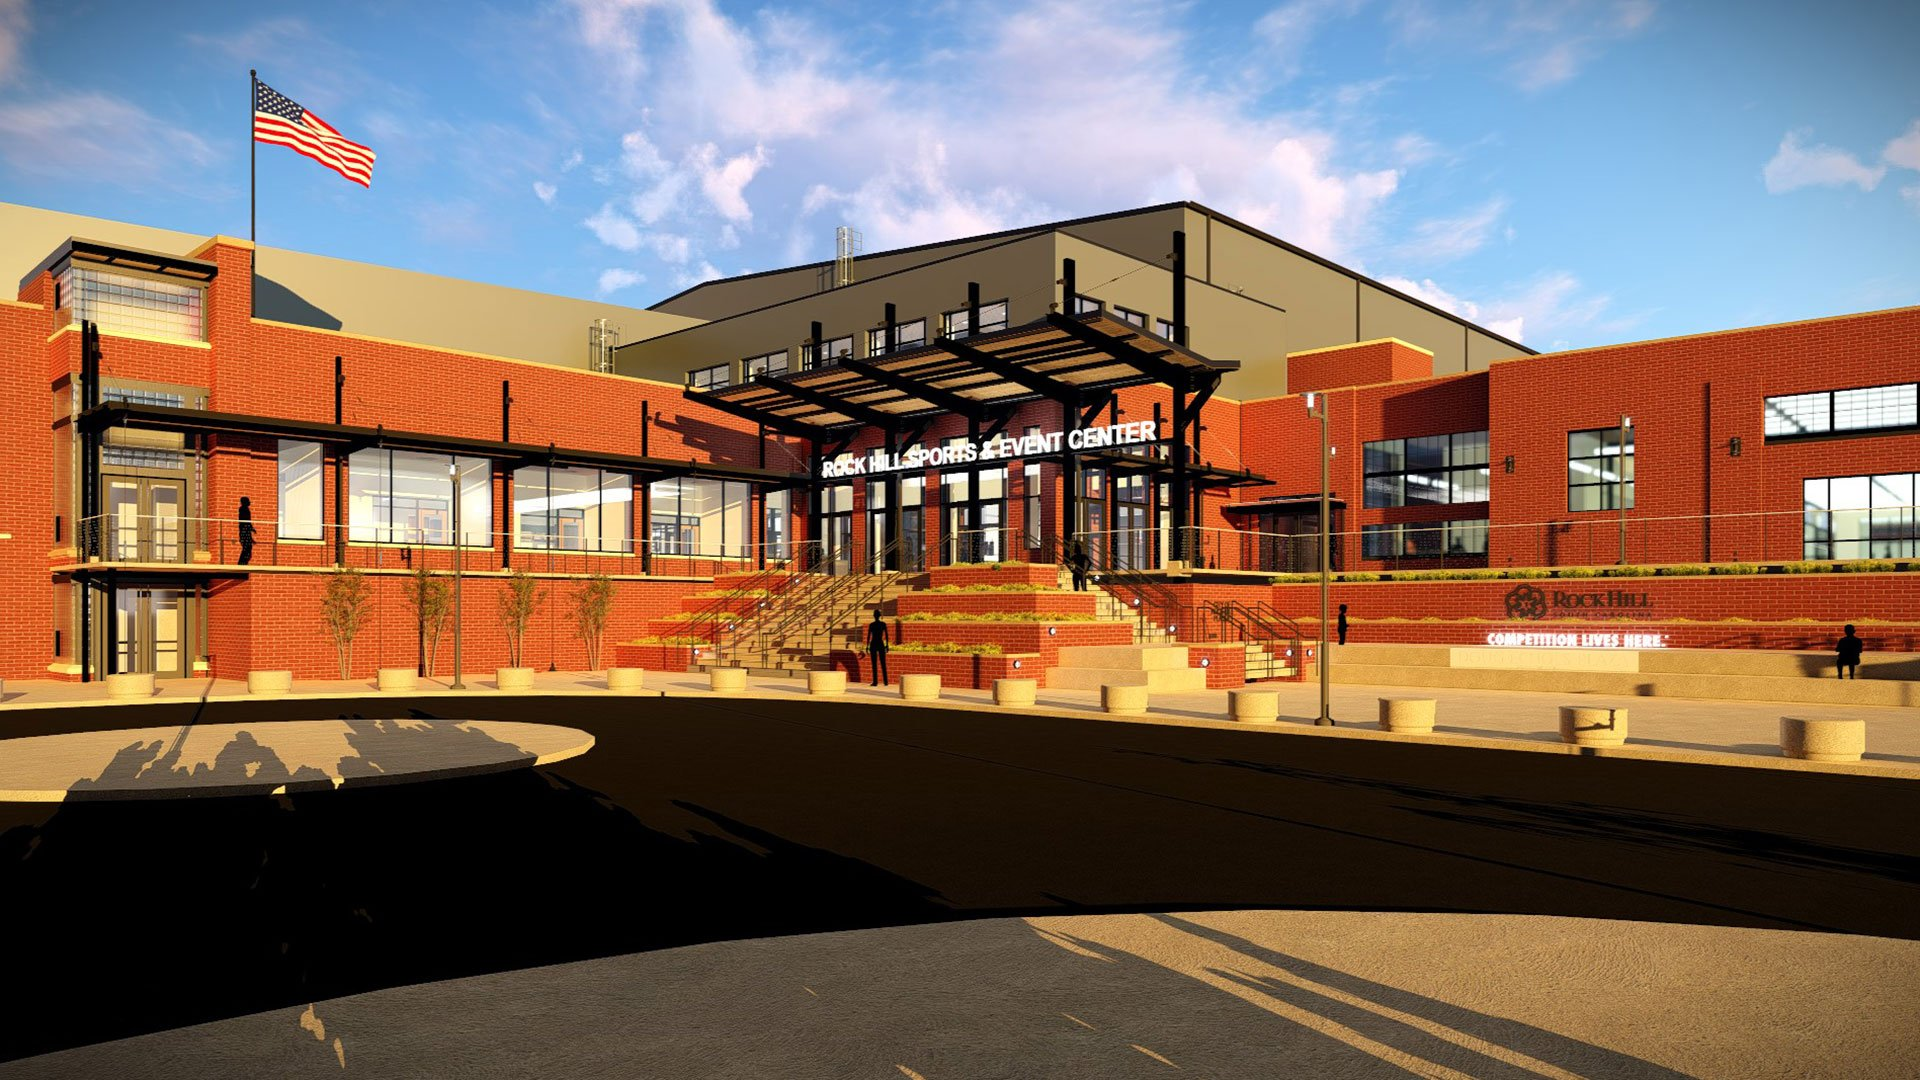 Rock Hill Sports & Event Center